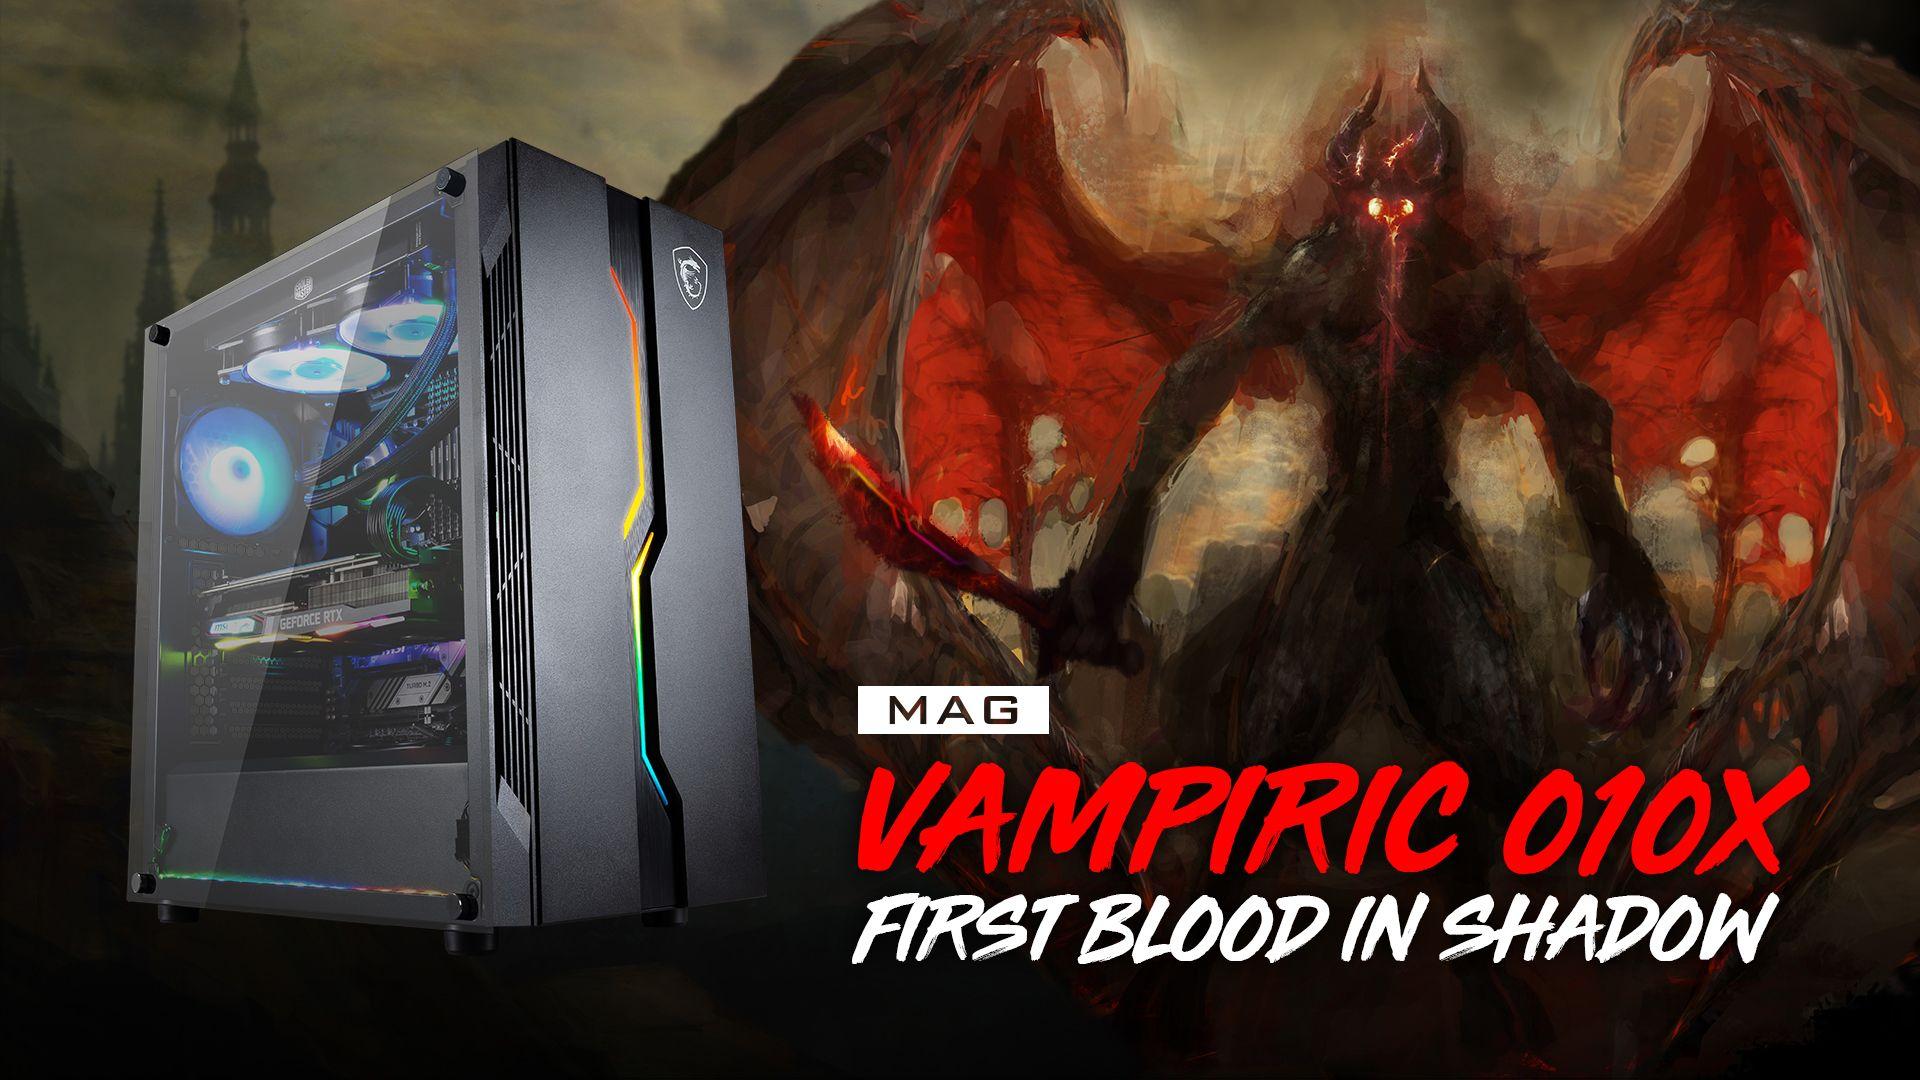 MSI MAG VAMPIRIC 010X CASE